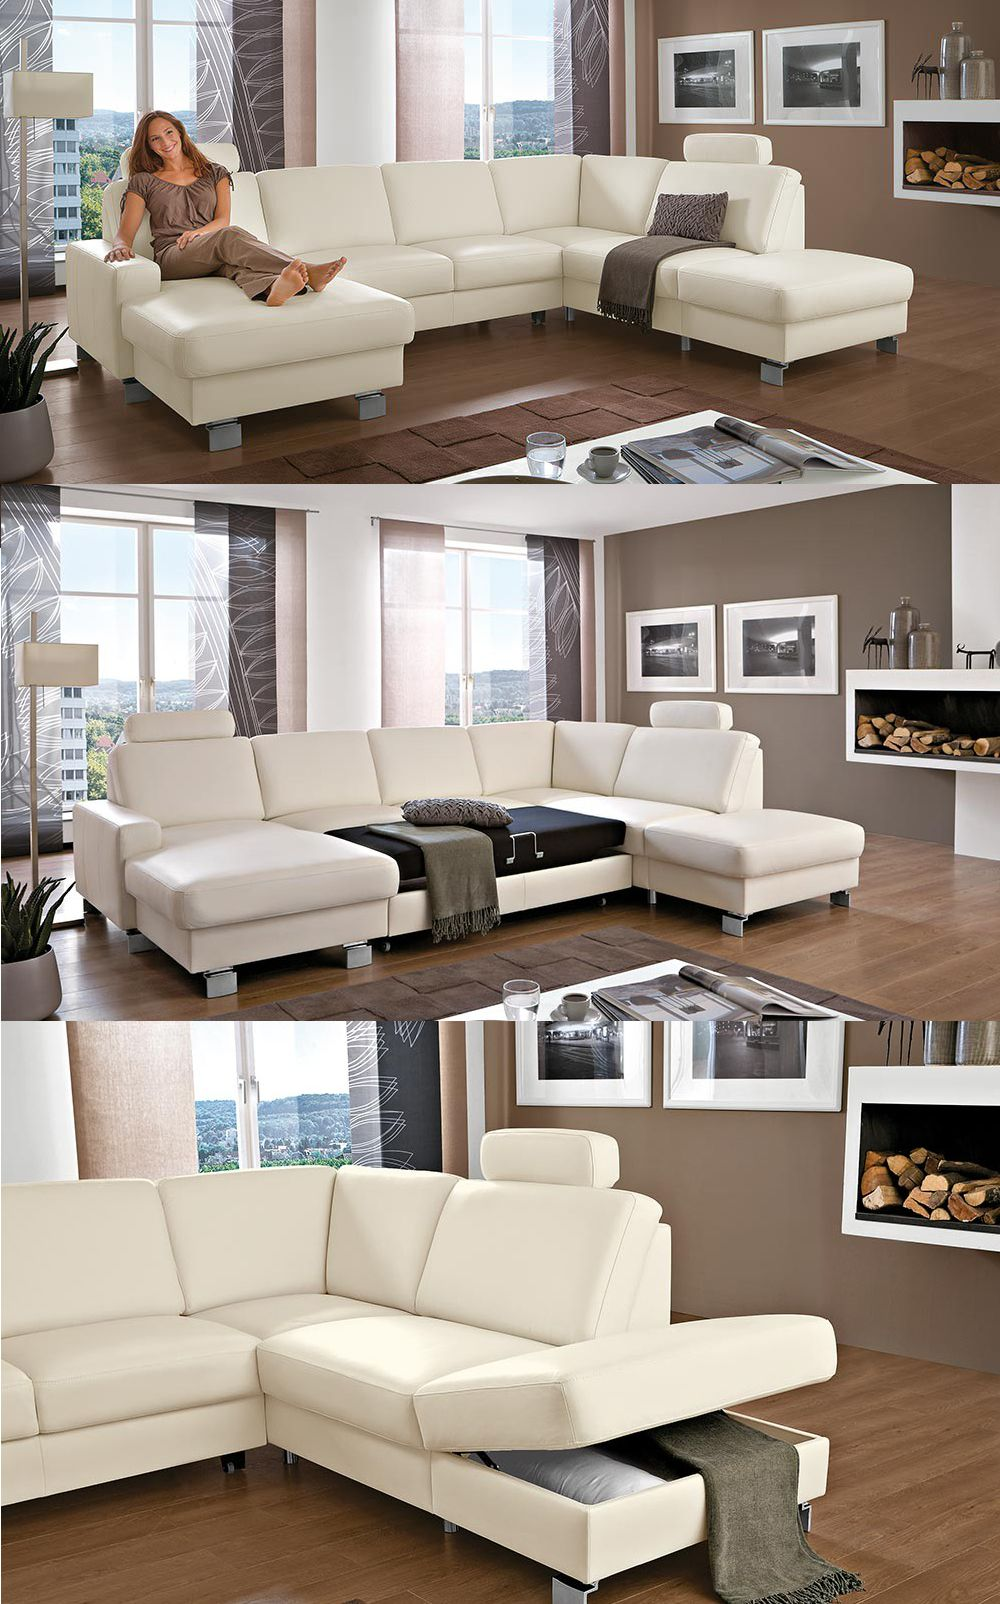 Weisses Ledersofa Bellini Die Hochwertige Wohnlandschaft Besticht Mit Tollen Relaxfunktione Corner Sofa Design Living Room Sofa Design Modern Sofa Living Room